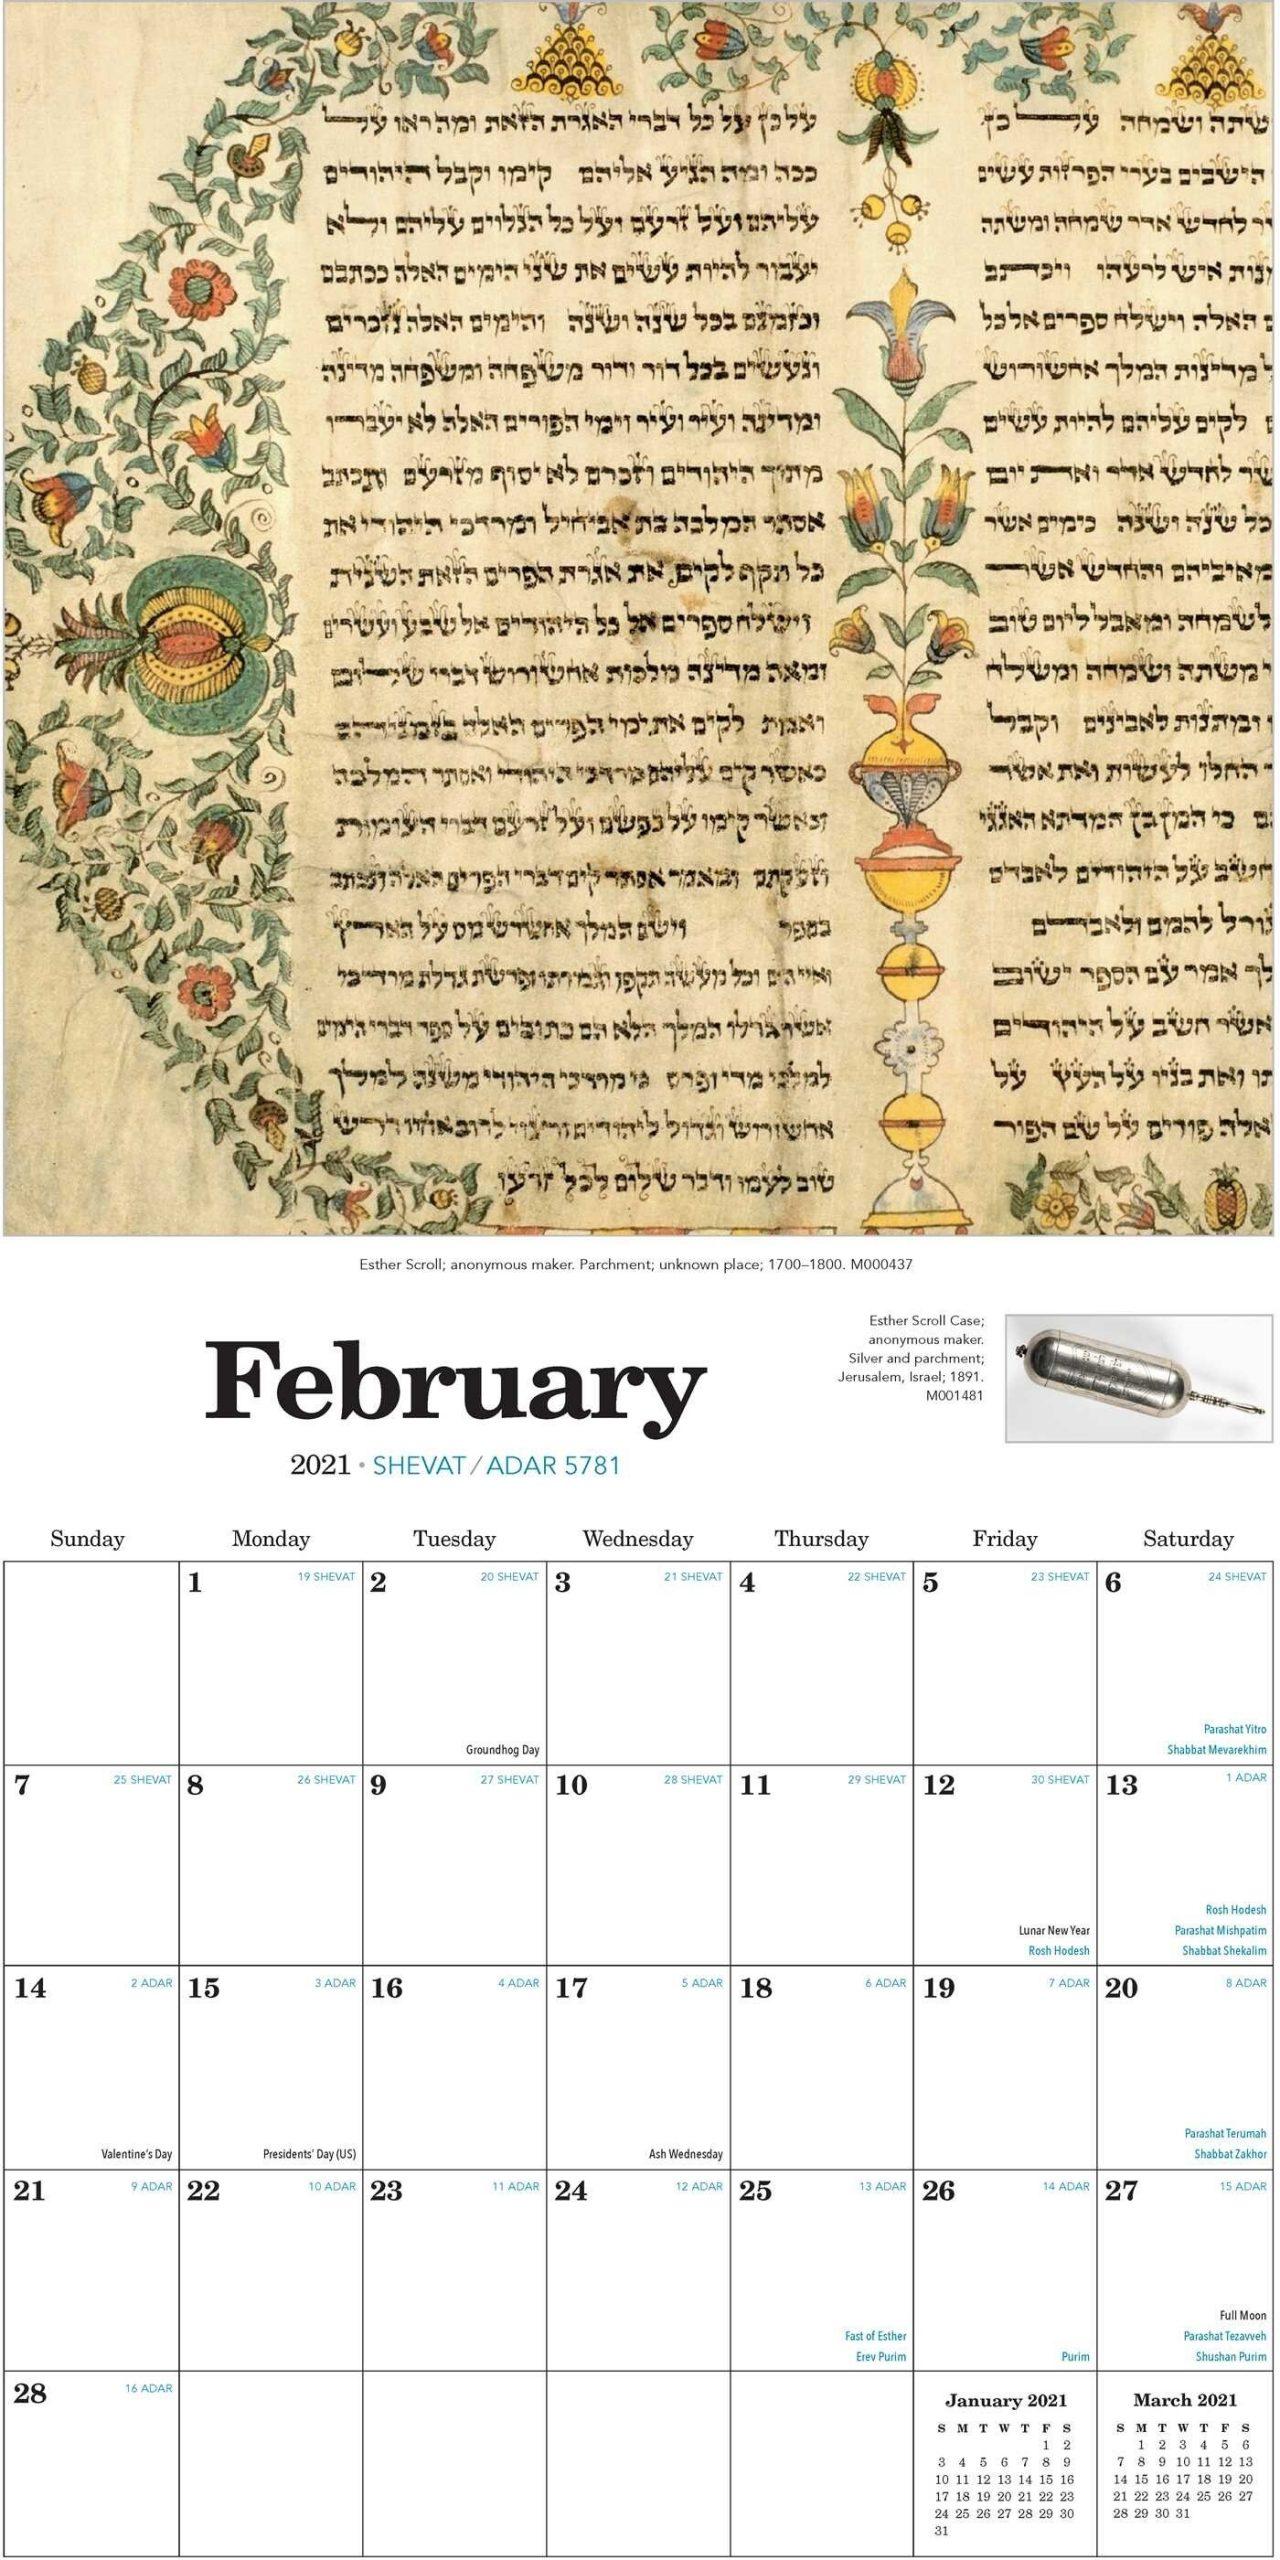 The 2021 Jewish Calendar 16-Month Wall Calendar - Book-Jewish Calendar For October 2021